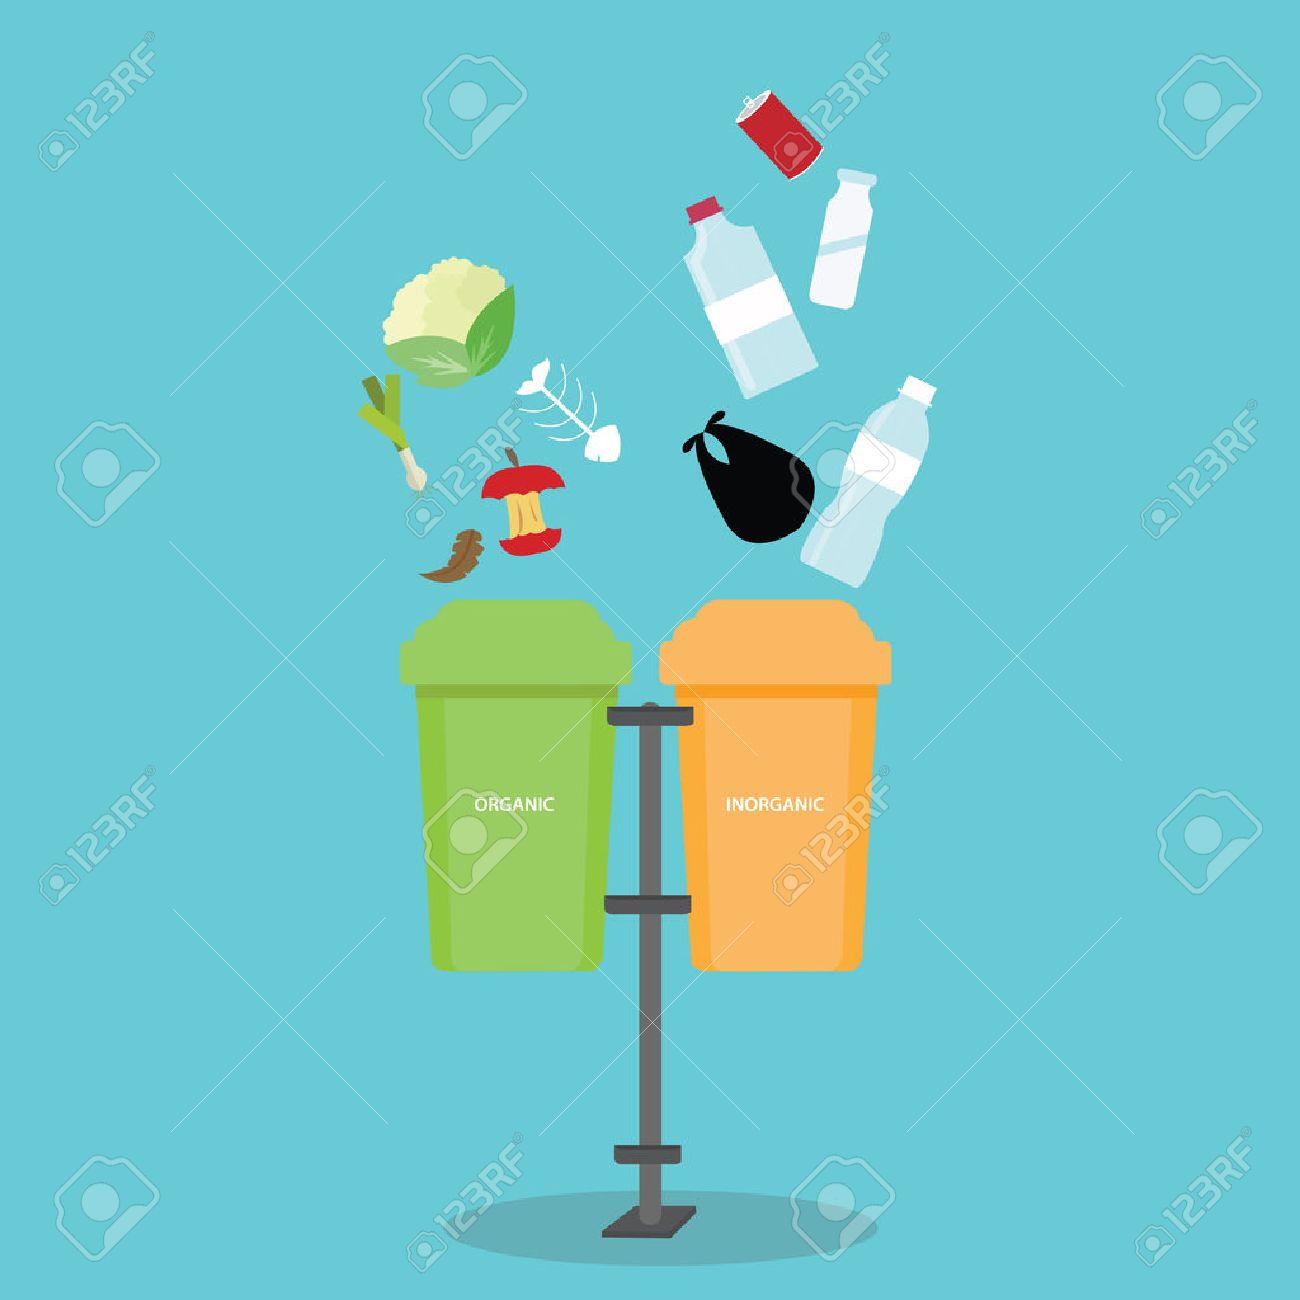 organic inorganic recycle garbage bin separation segregate separate bottle degradable waste trash vector - 52563717